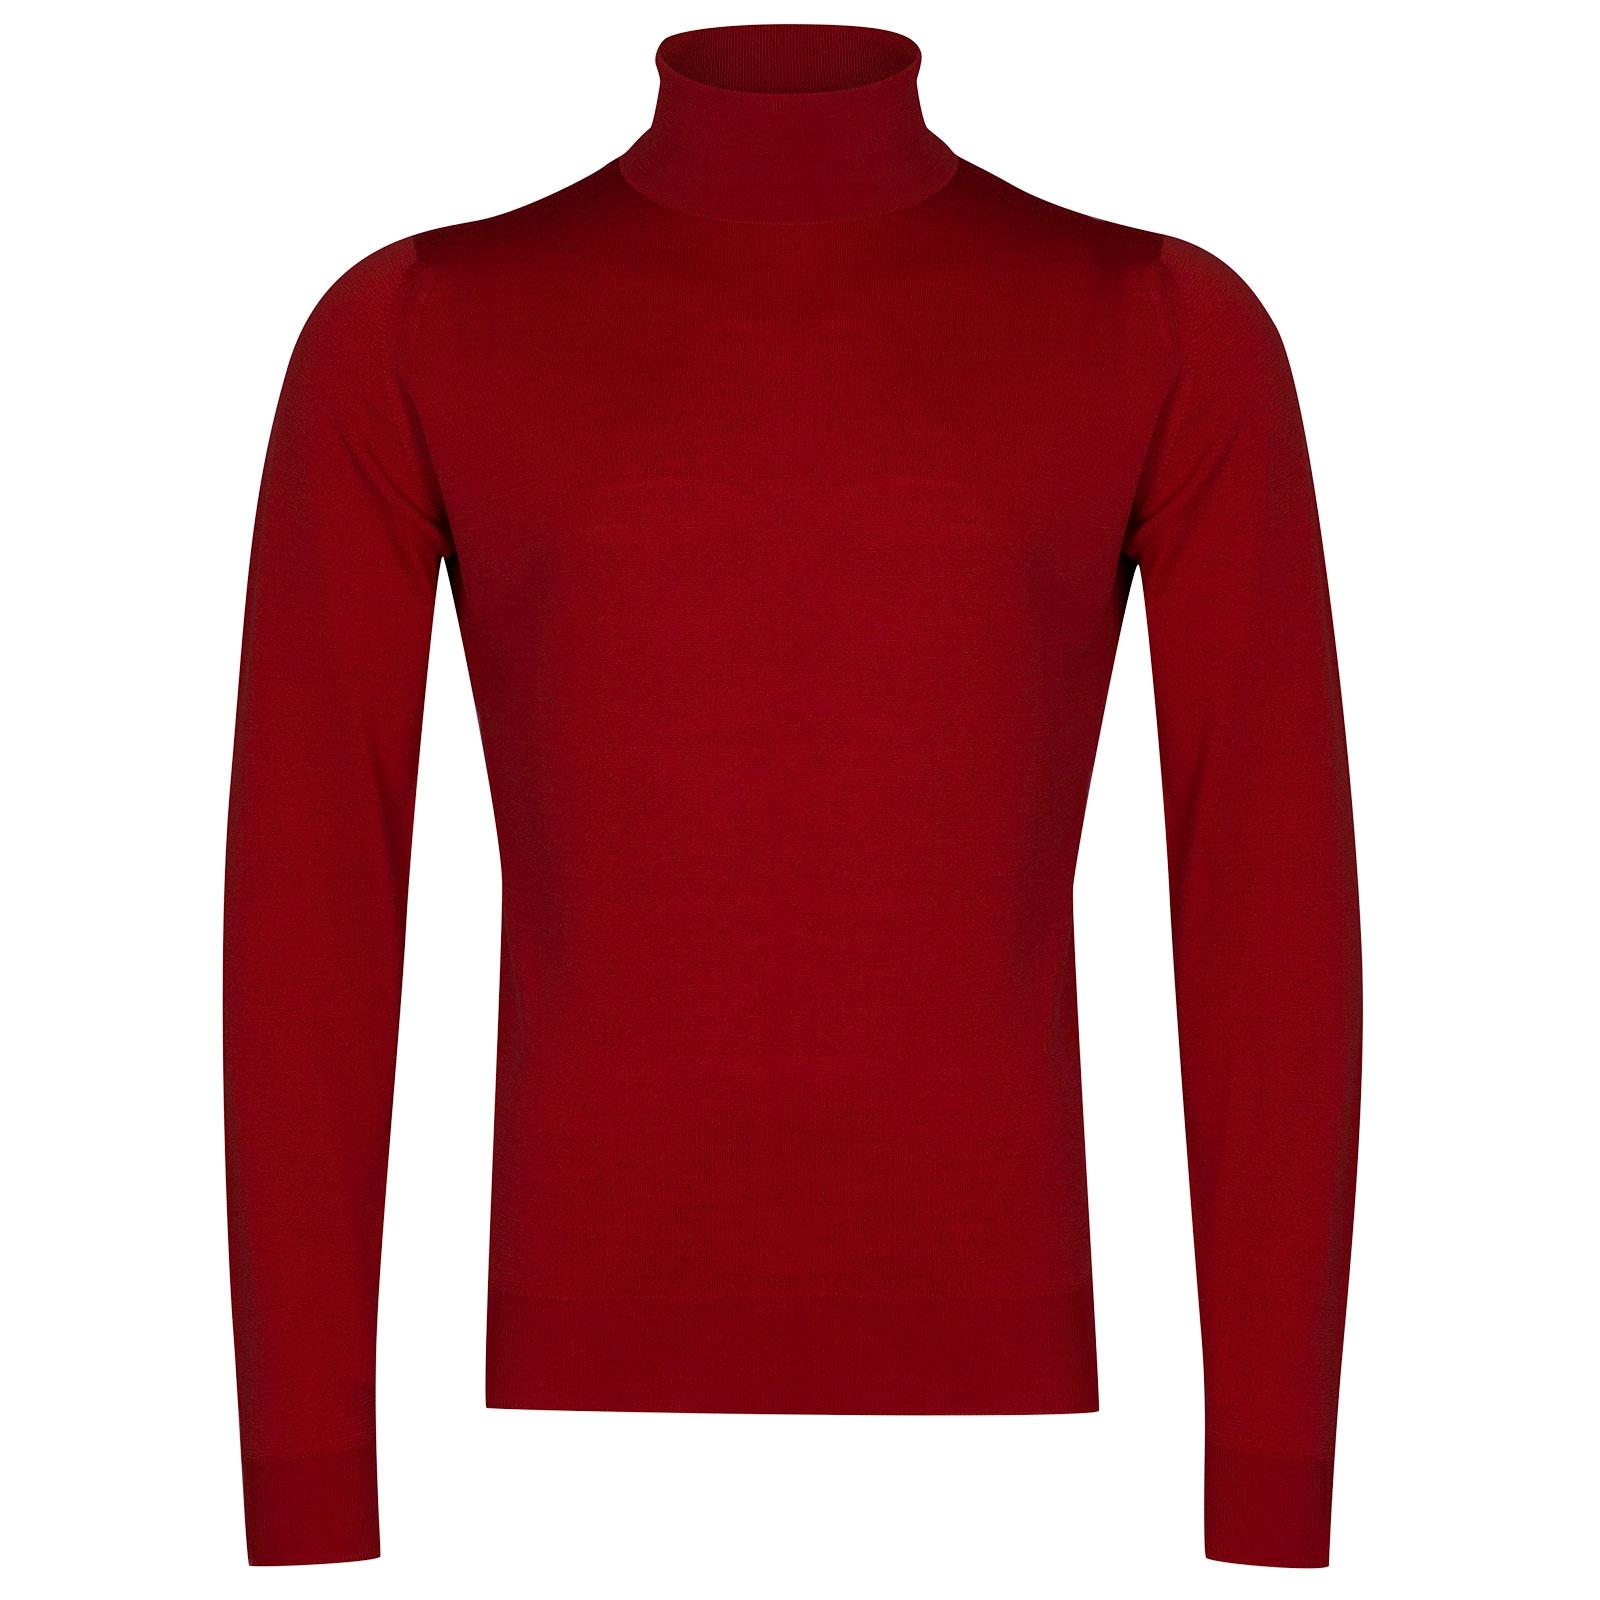 John Smedley cherwell Merino Wool Pullover in Crimson Forest-XXL